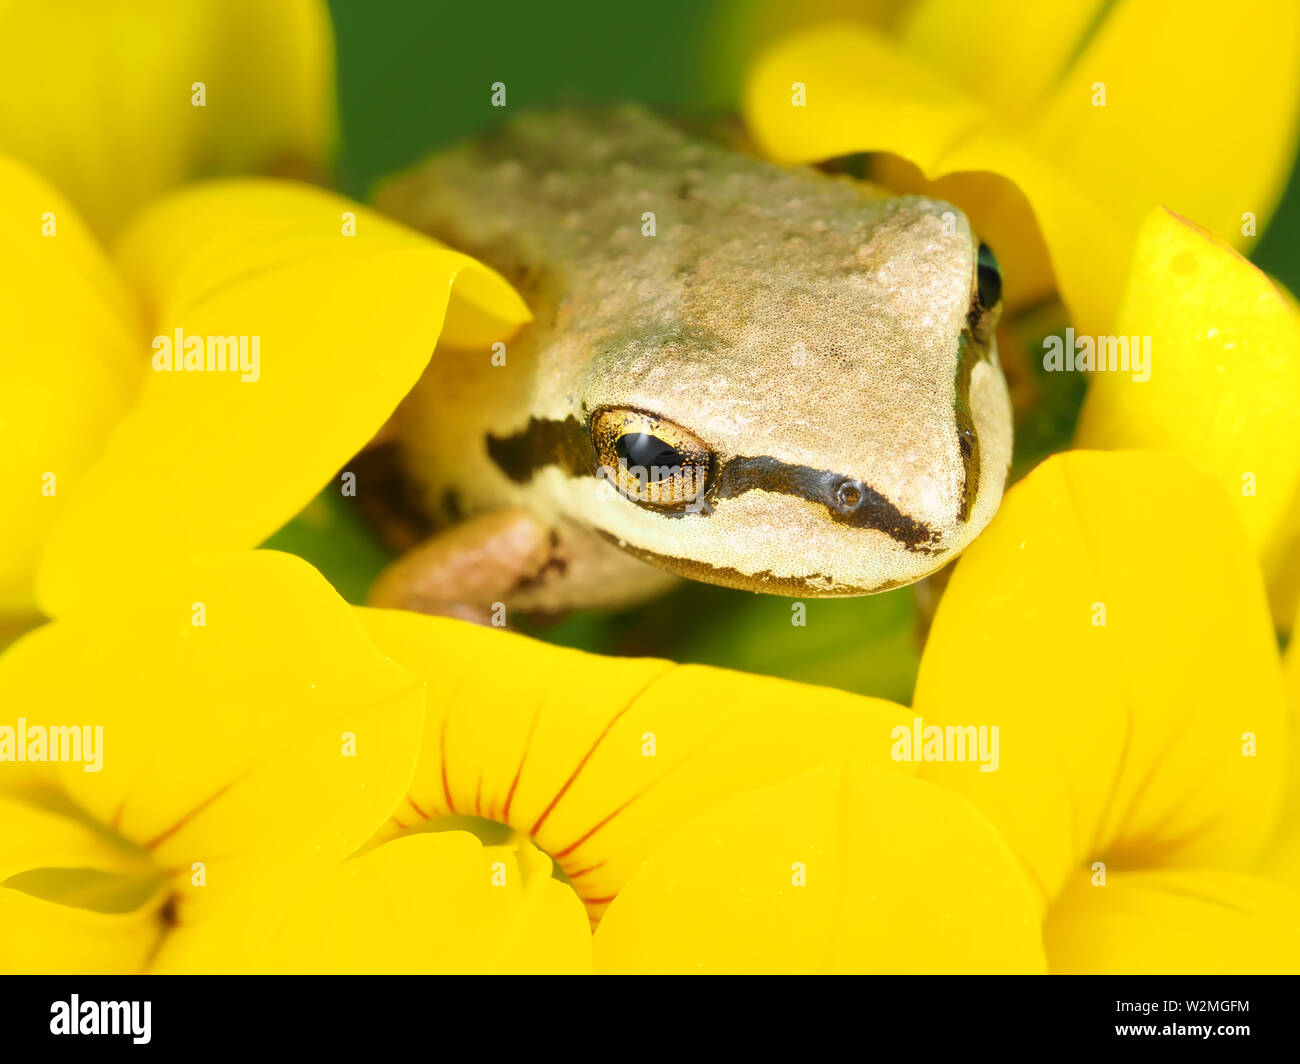 Tiny Pacific tree frog (Pseudacris regilla) sitting in a flower Stock Photo